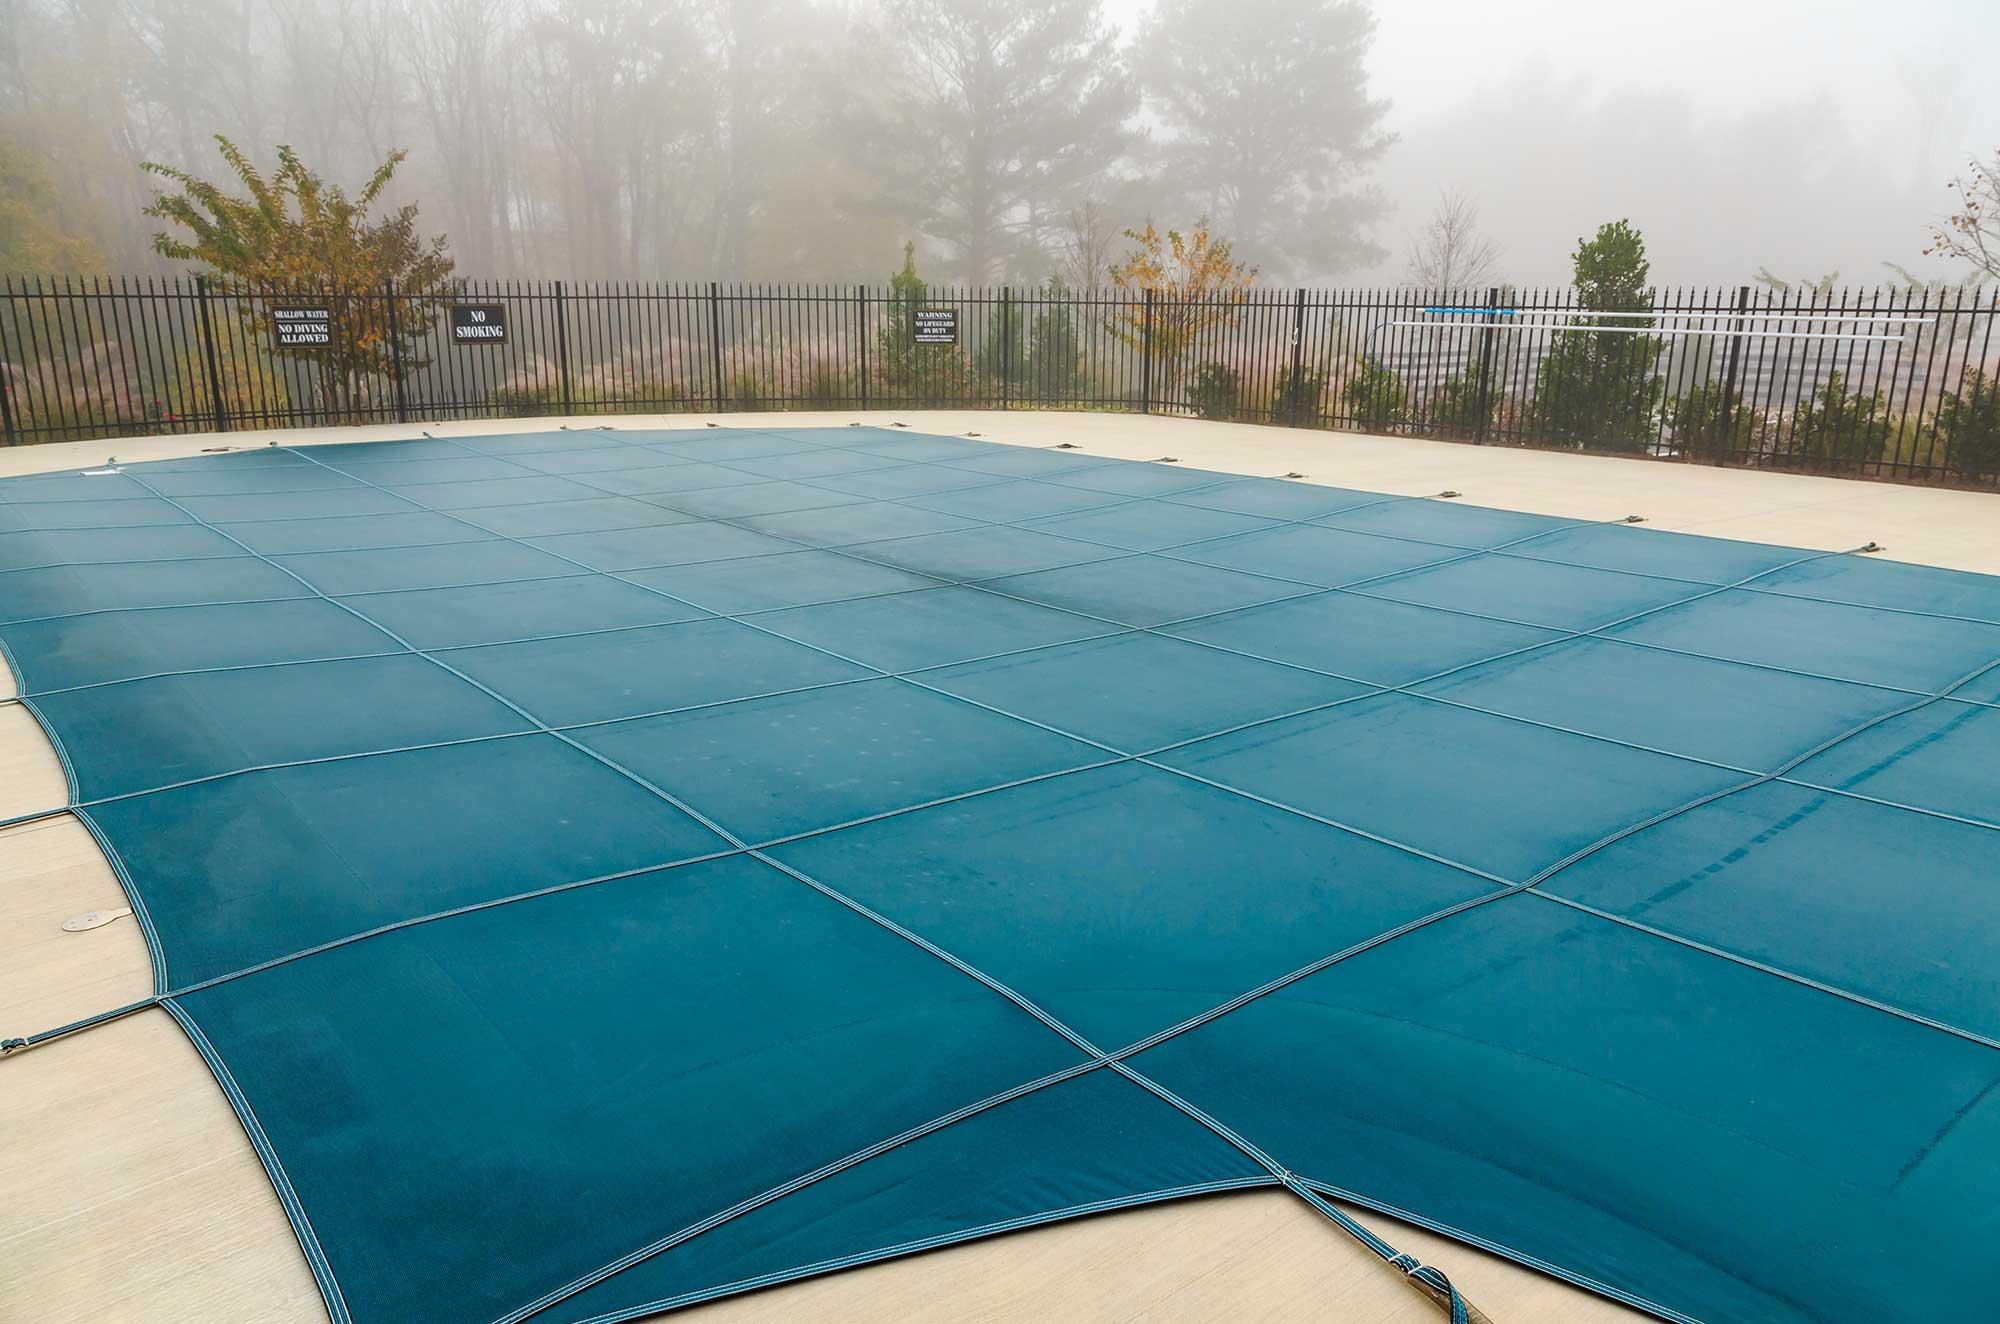 Battle Of The Pool Covers Solar Blanket Vs Liquid Buds Pools